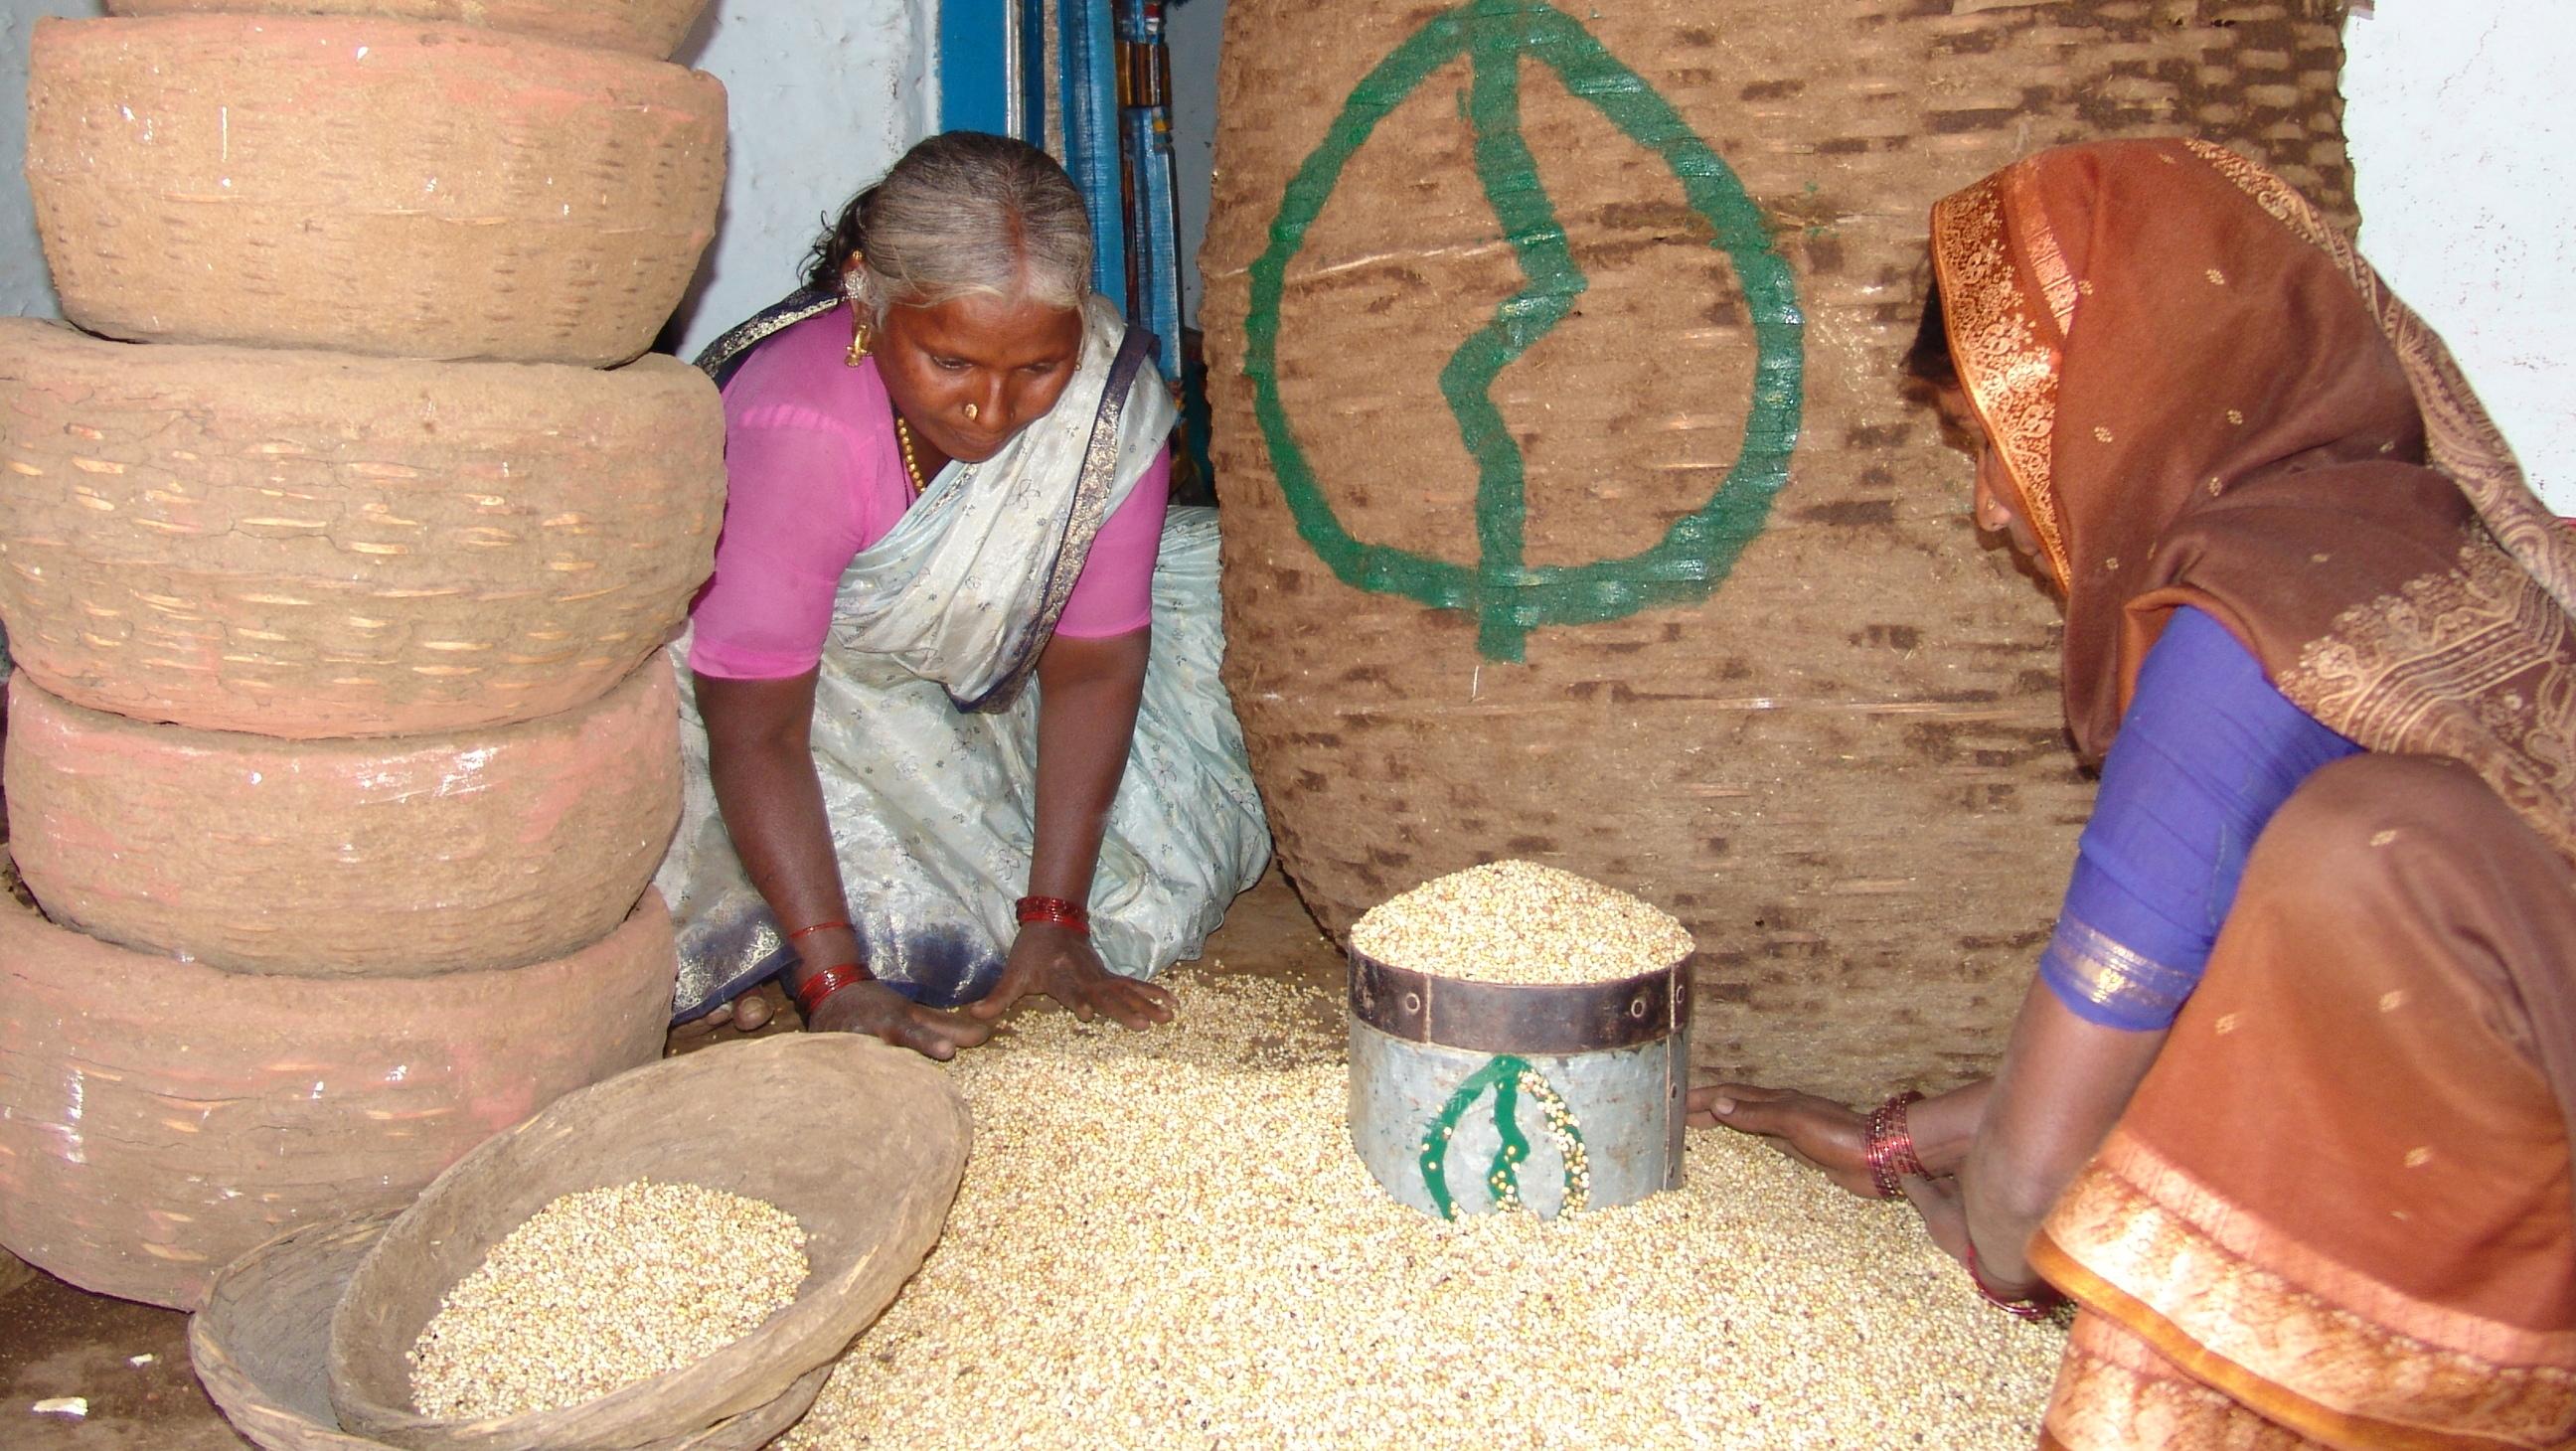 Women distributing seeds in Andhra Pradesh, India (Photo: Deccan Development Society)